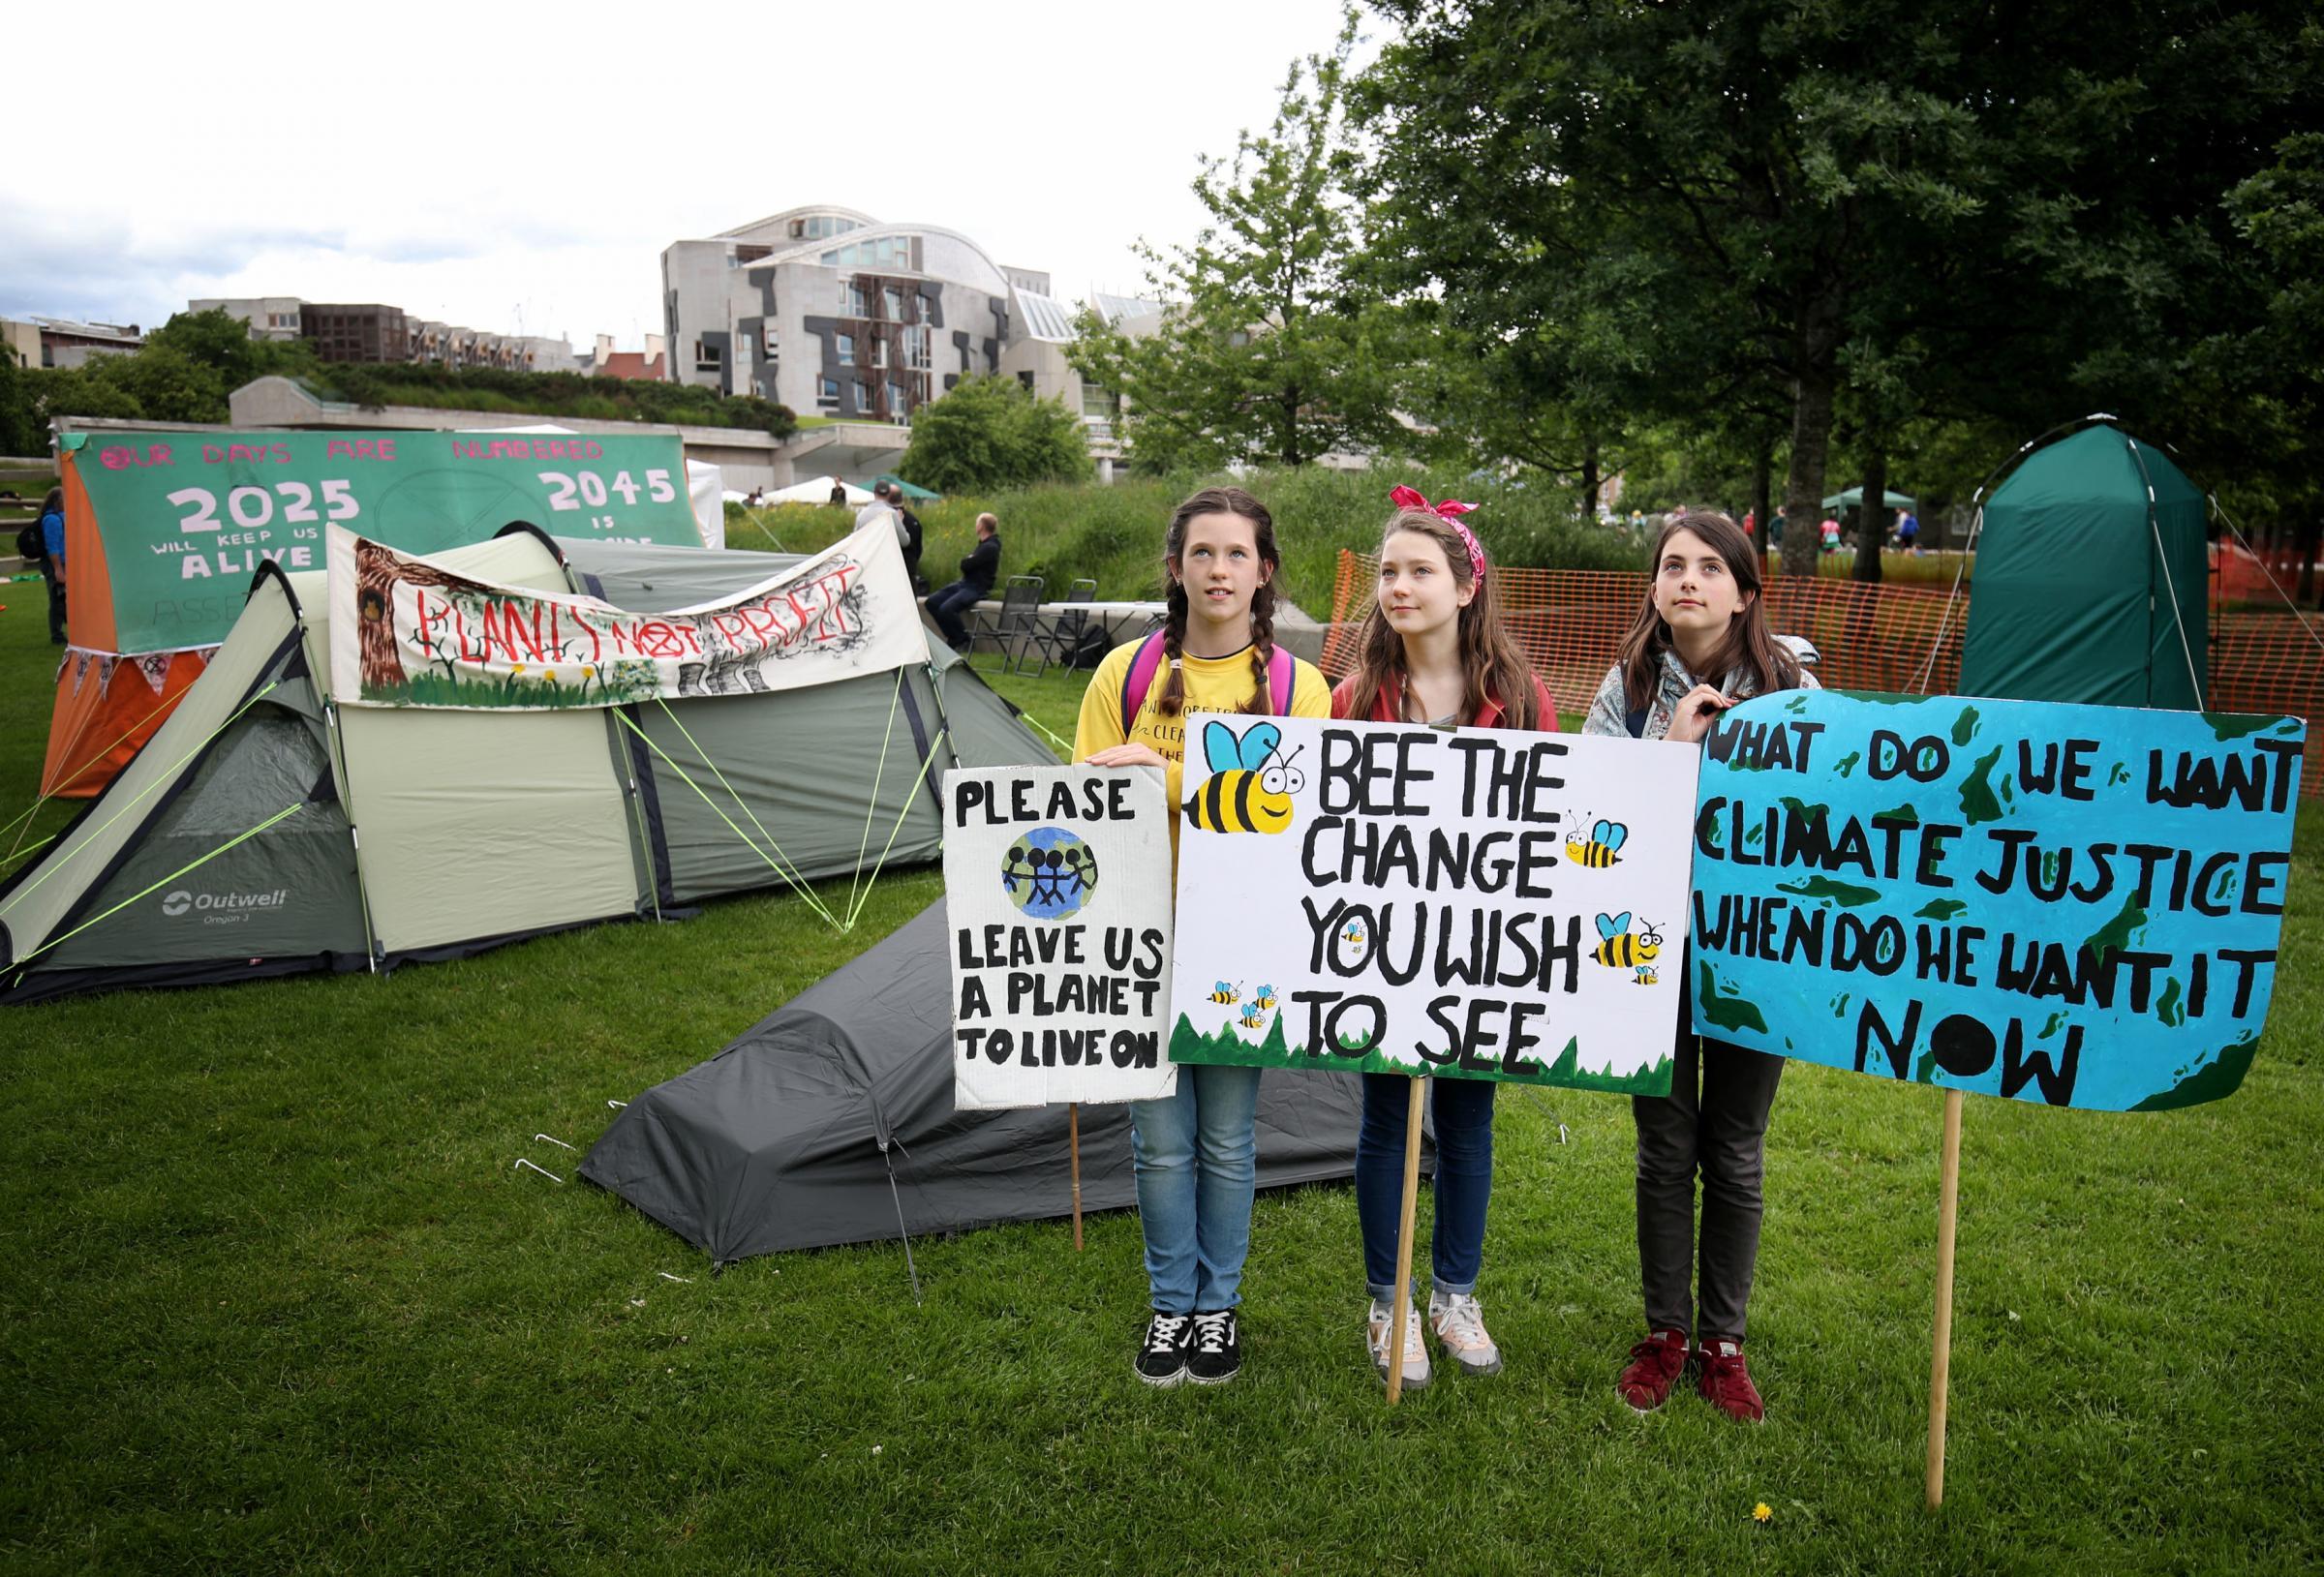 Extinction Rebellion activists at Holyrood camp warn of disruption and arrests